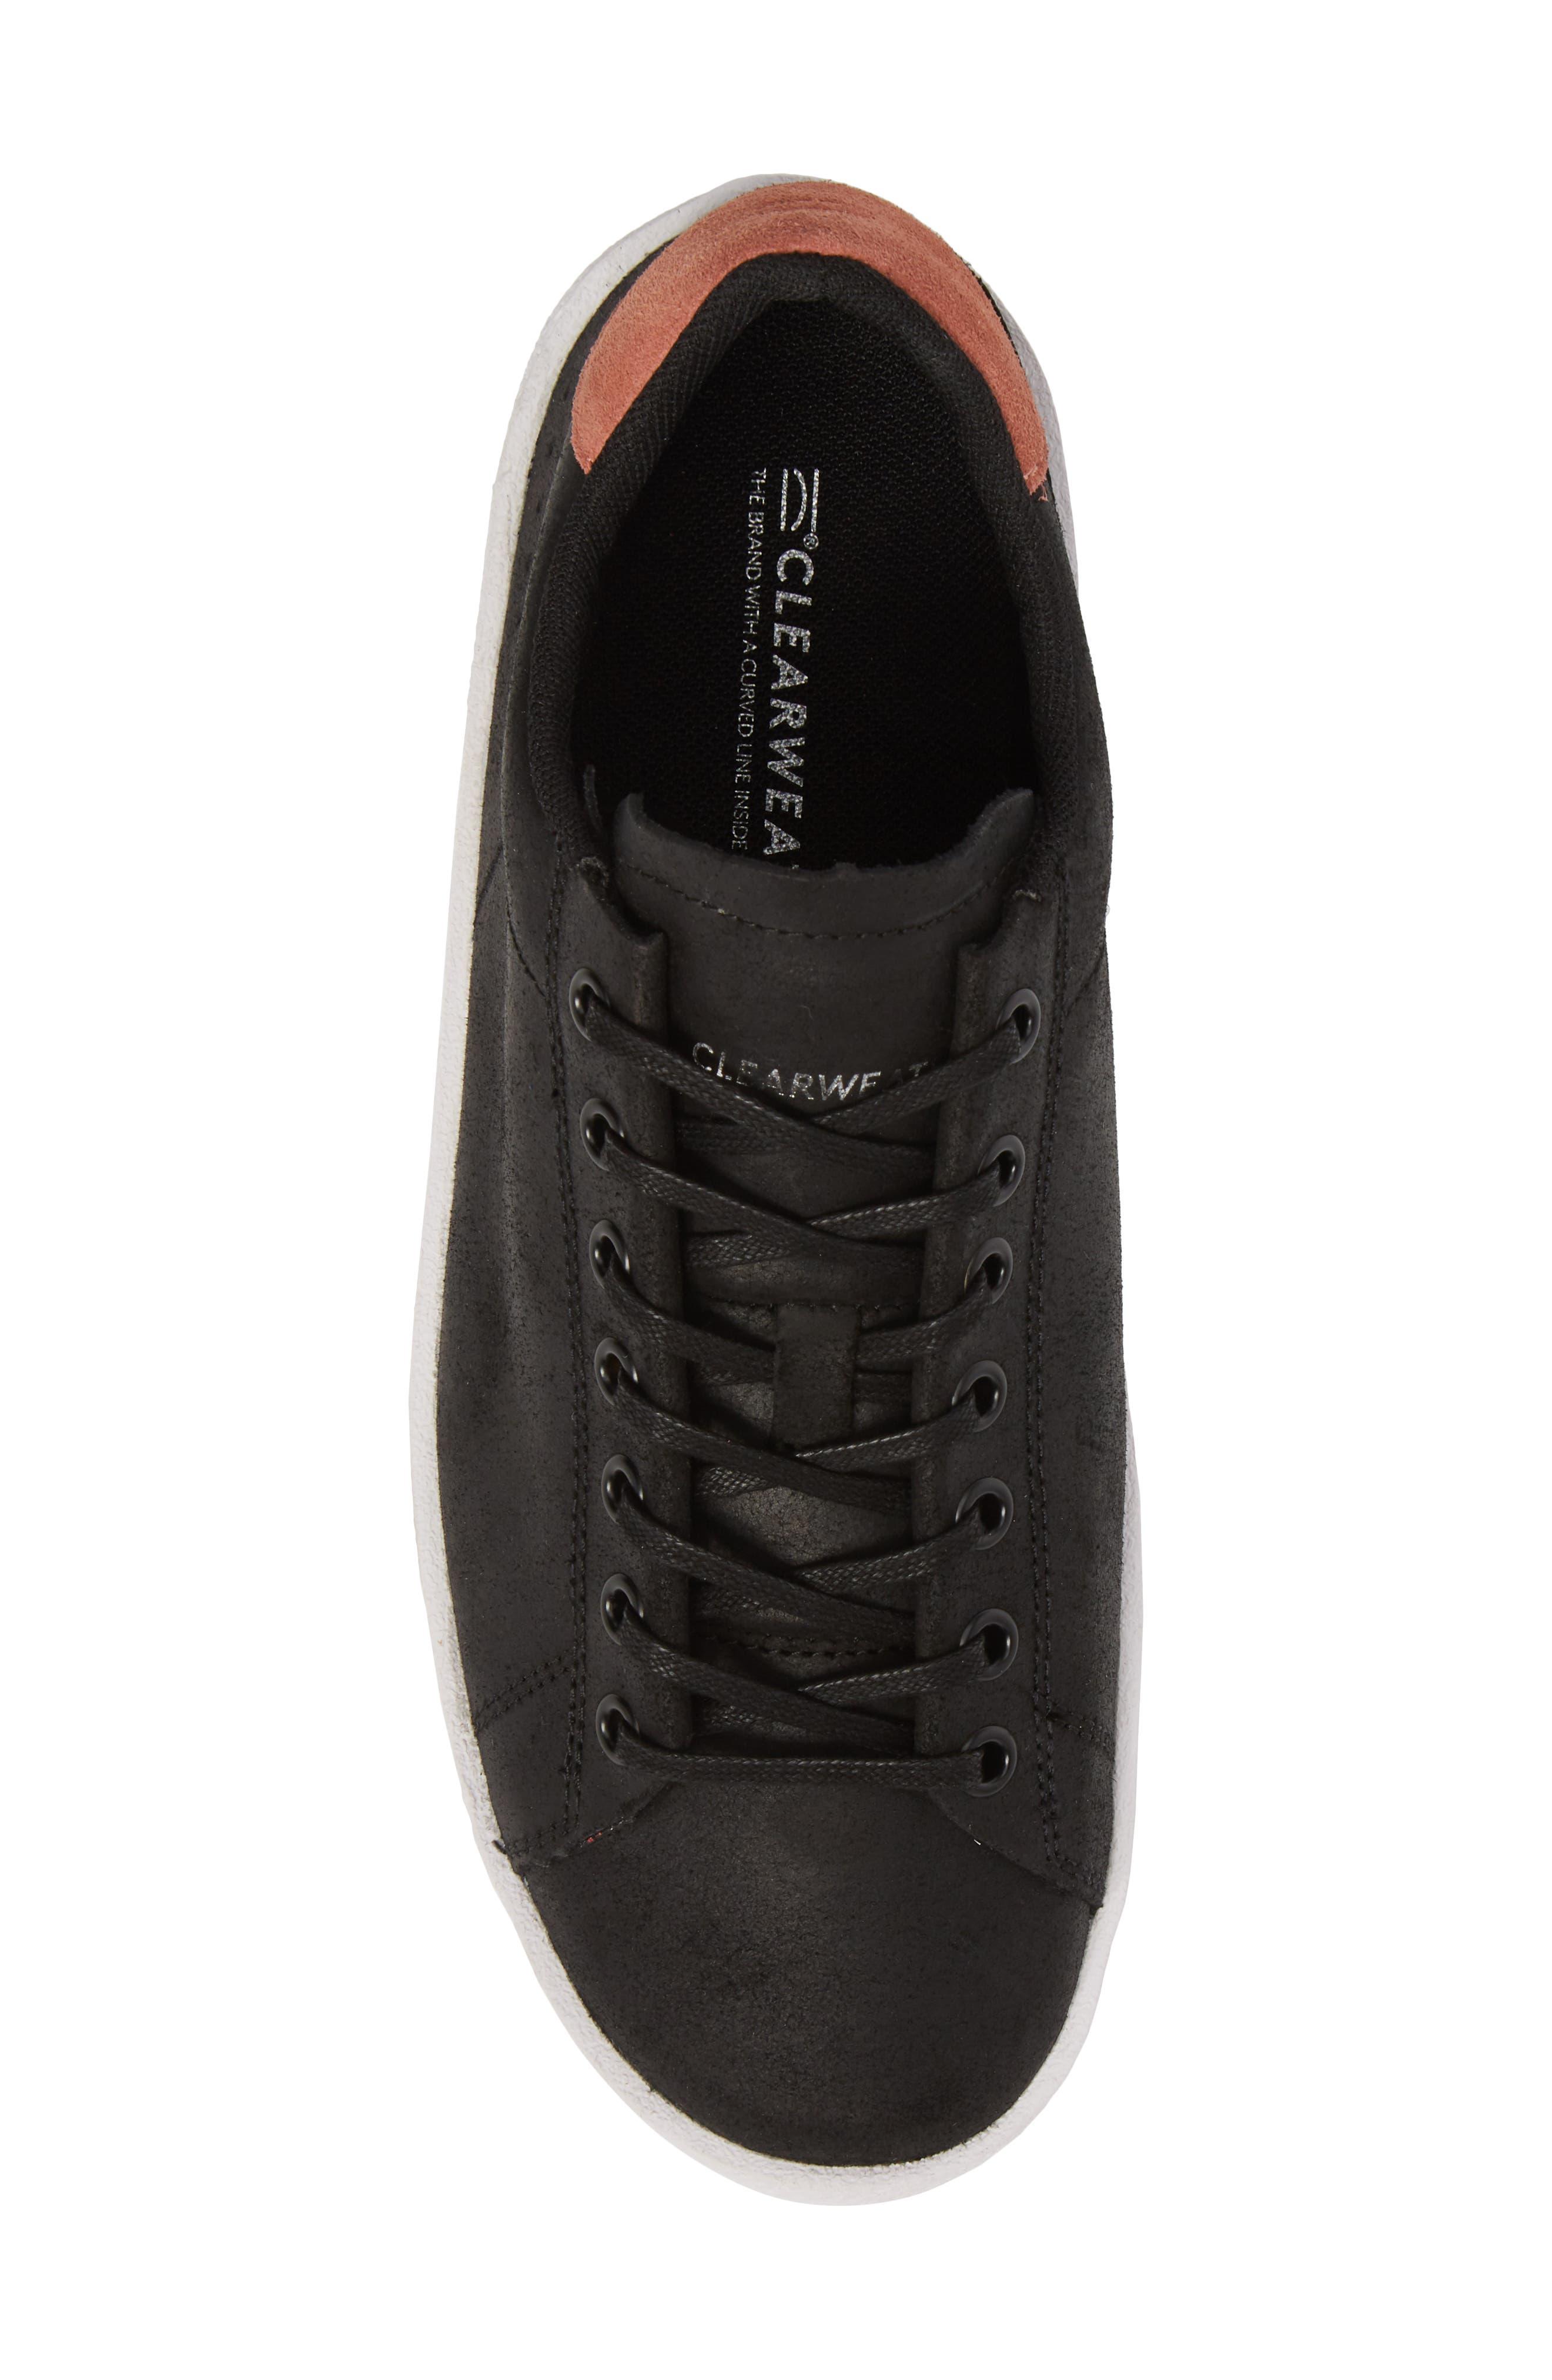 Jones Platform Sneaker,                             Alternate thumbnail 5, color,                             Black Leather